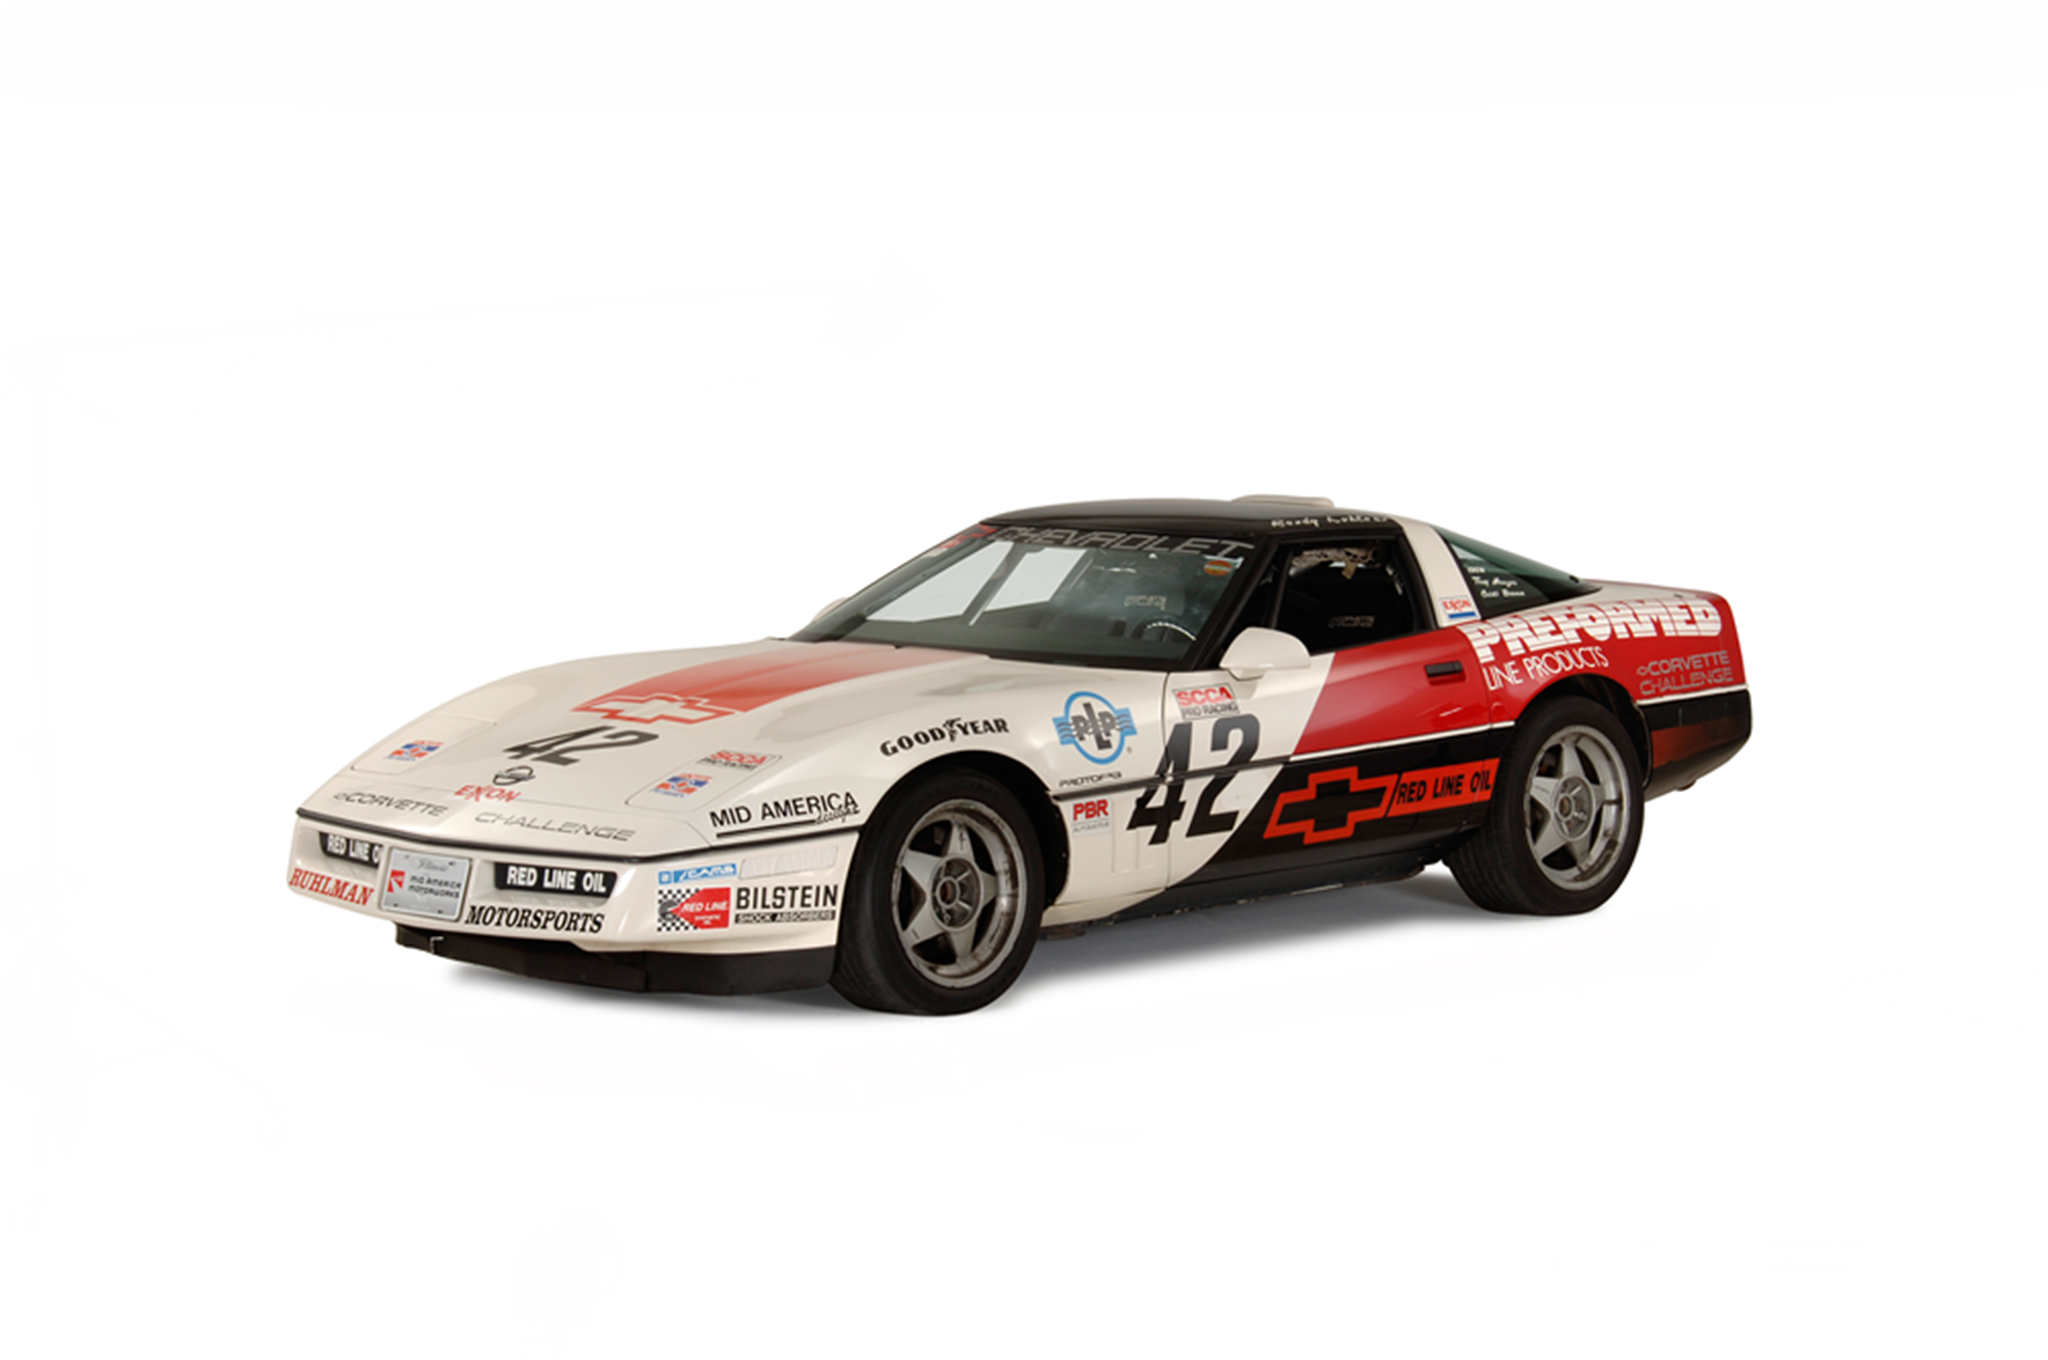 Just Listed: Four Chevrolet Corvette C4 Challenge Cars ...